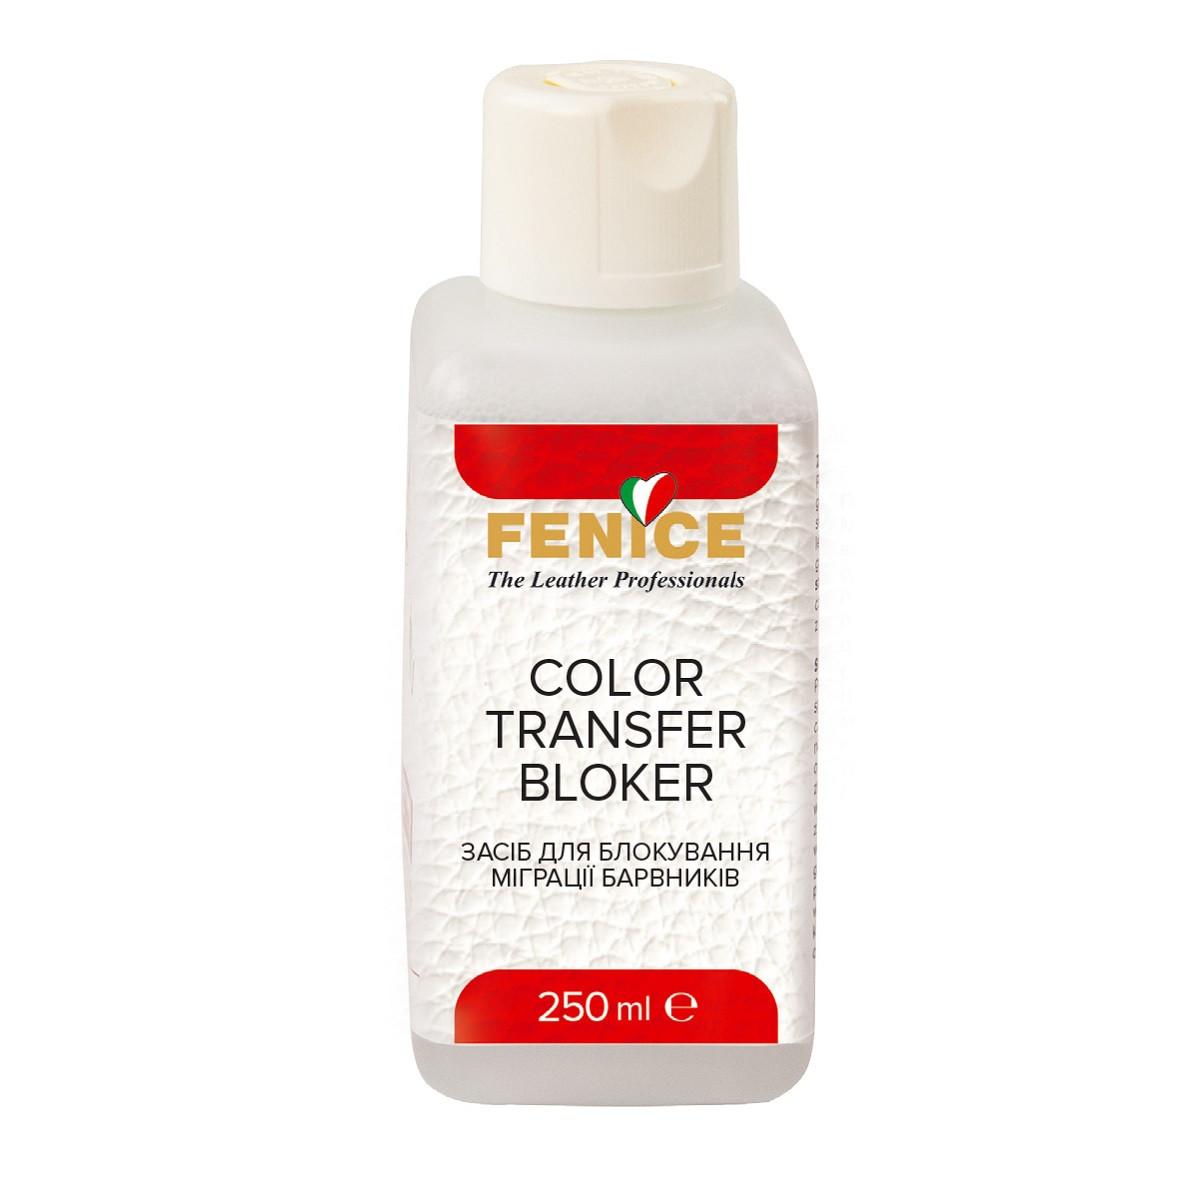 Защитный раствор Fenice Color Transfer Bloker 250 ml